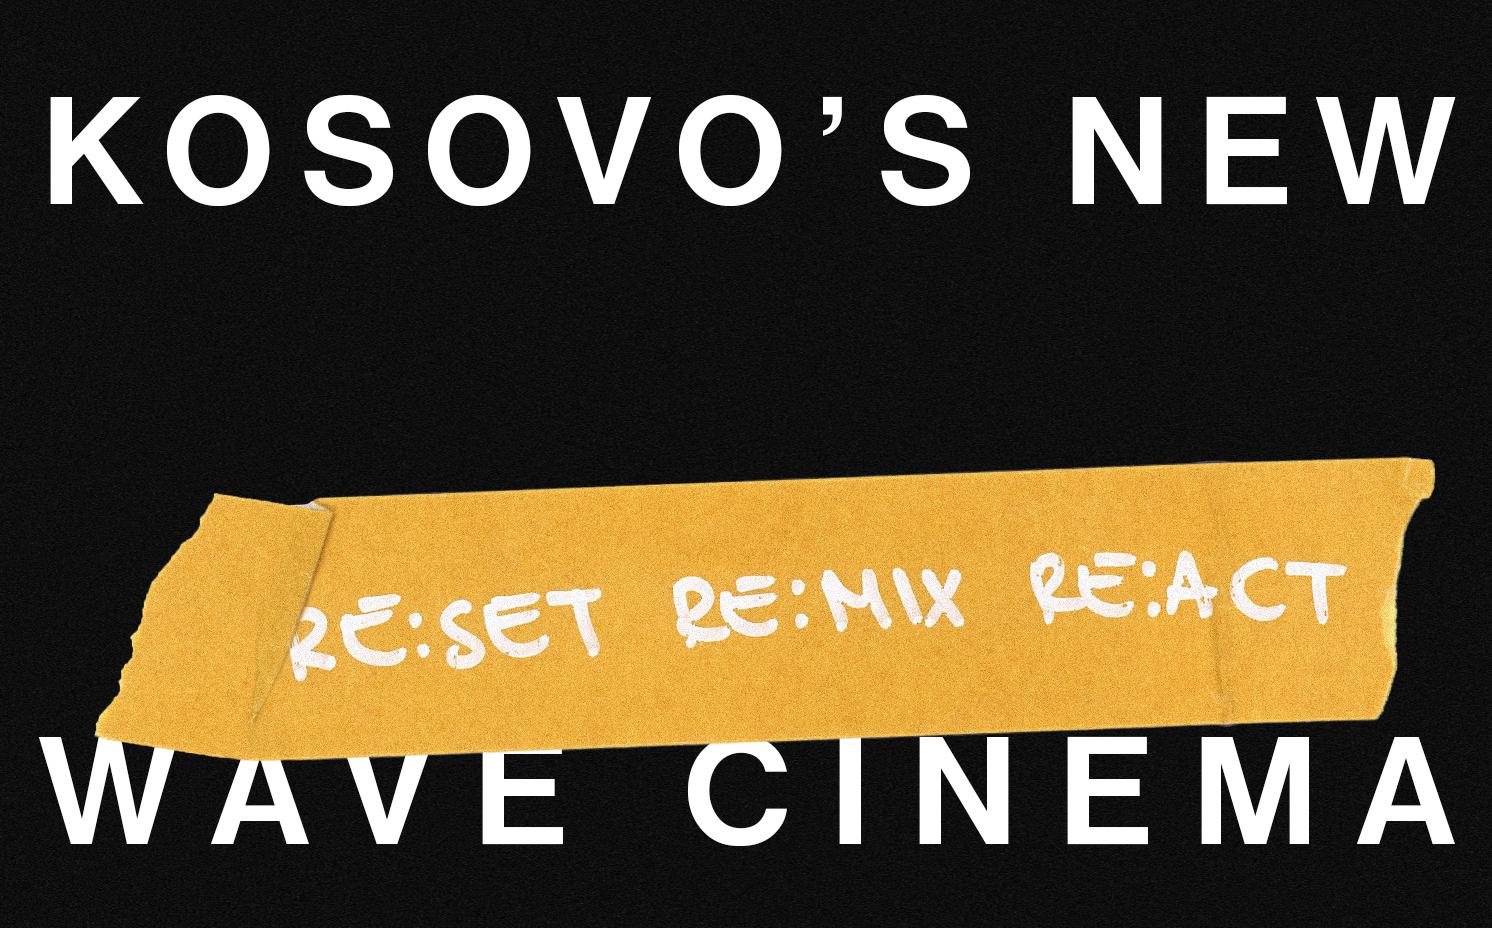 KOSOVO'S NEW WAVE CINEMA